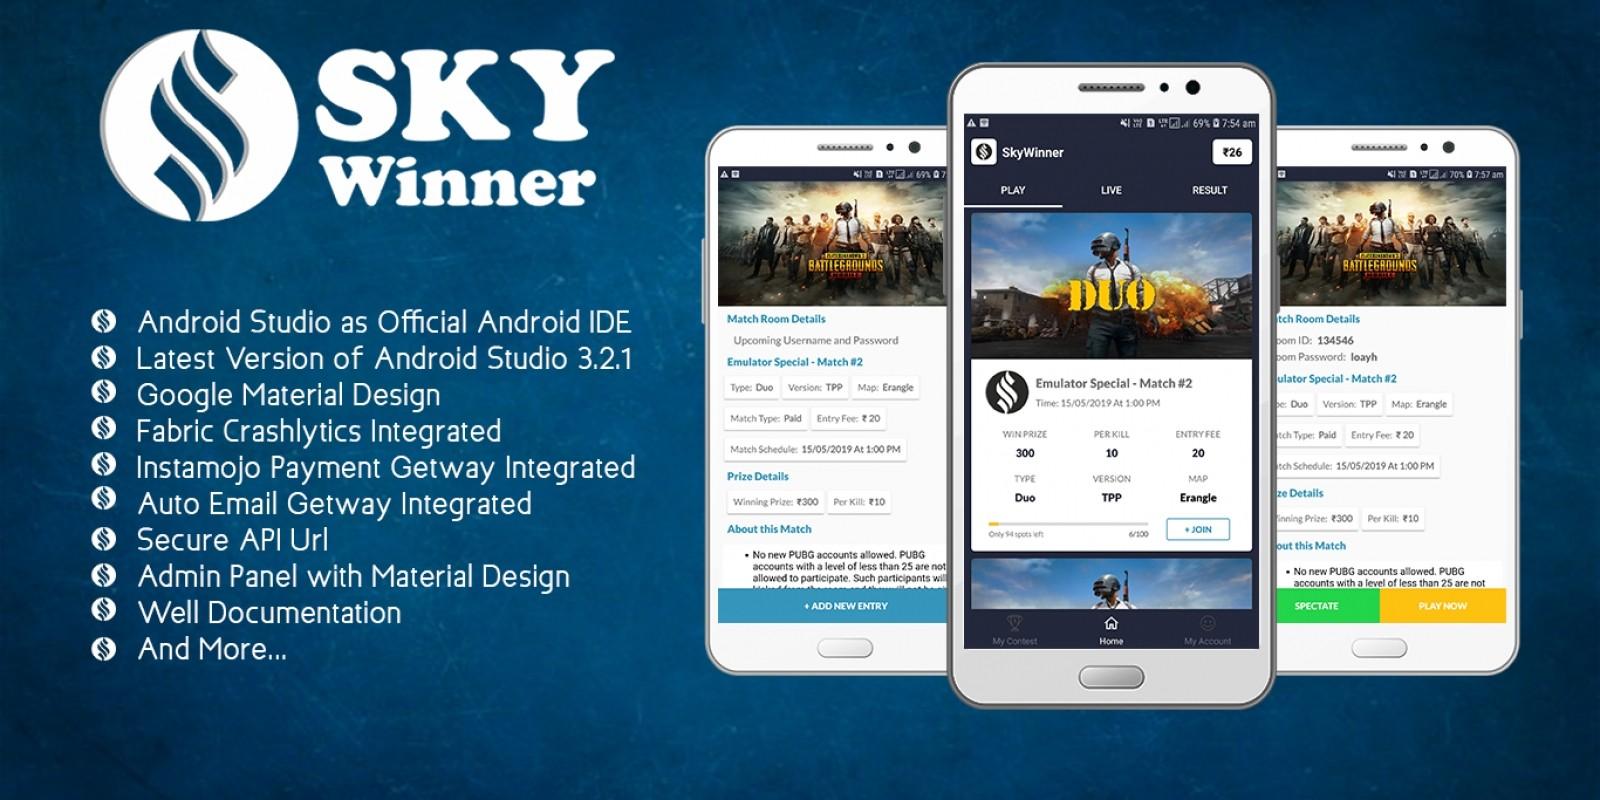 SkyWinner - PUBG Tournaments Organiser Android App